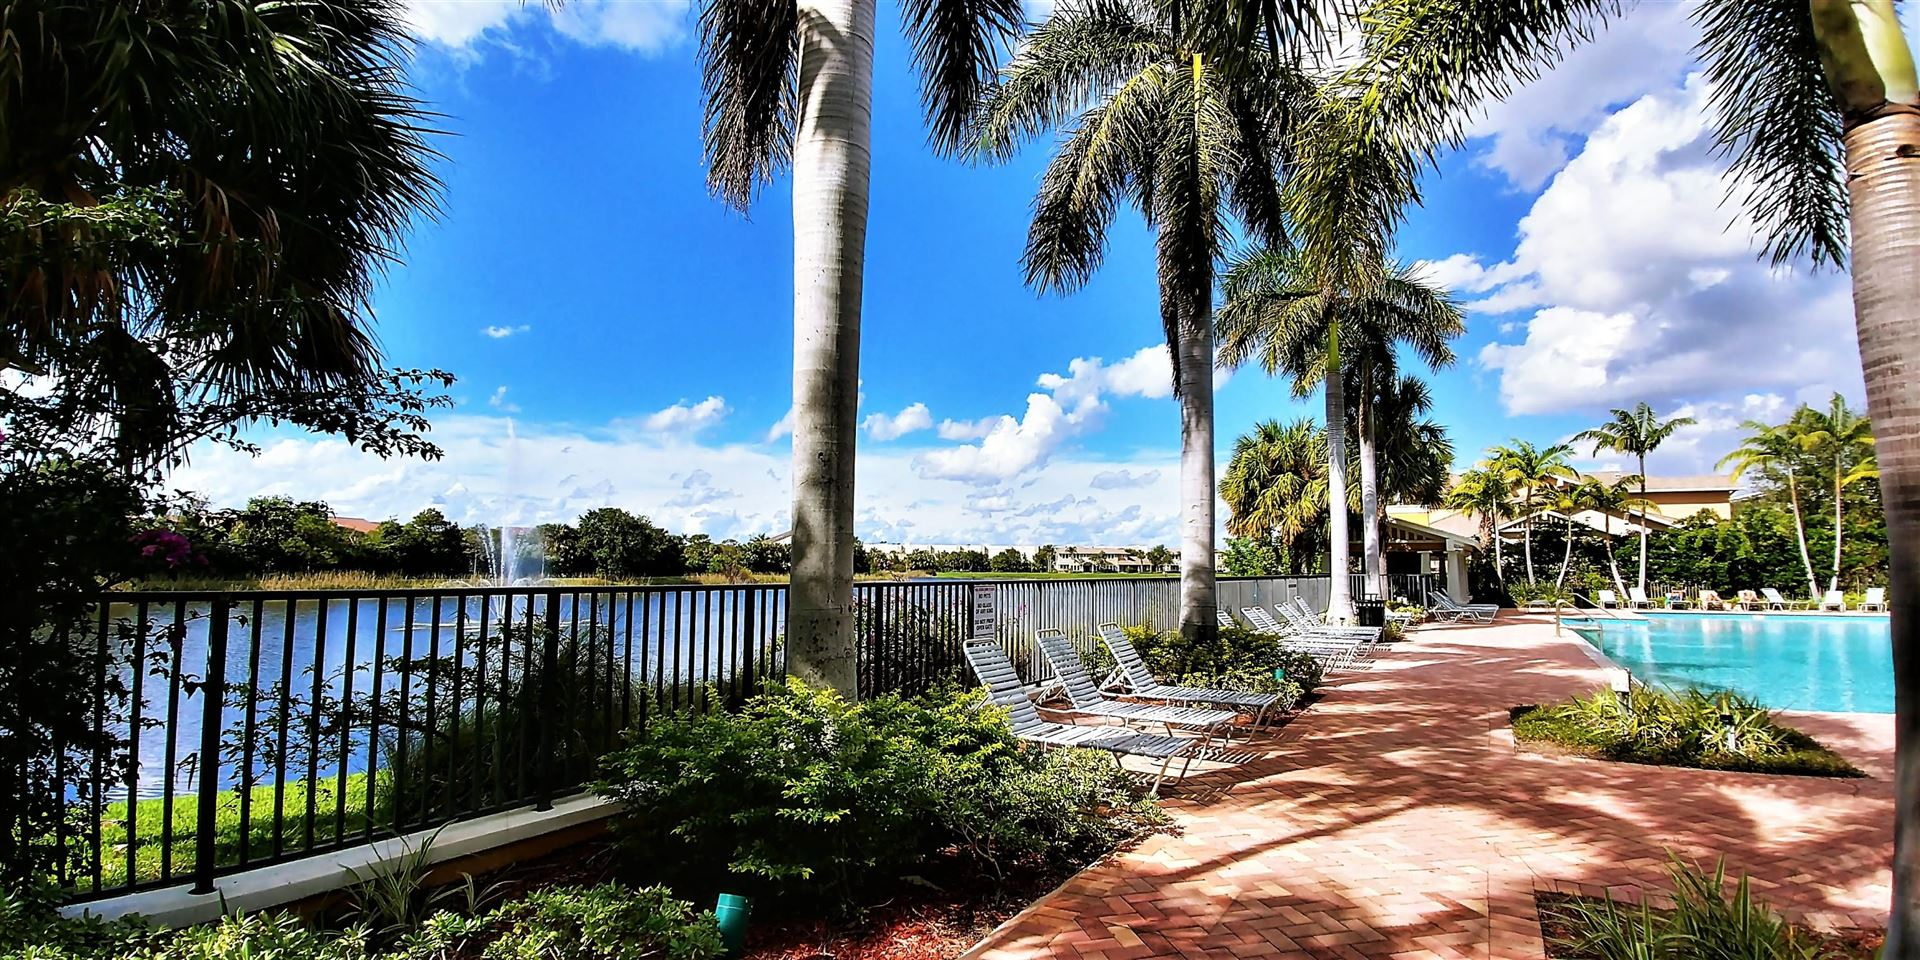 850 Millbrae Court #4, West Palm Beach, FL 33401 - #: RX-10649099